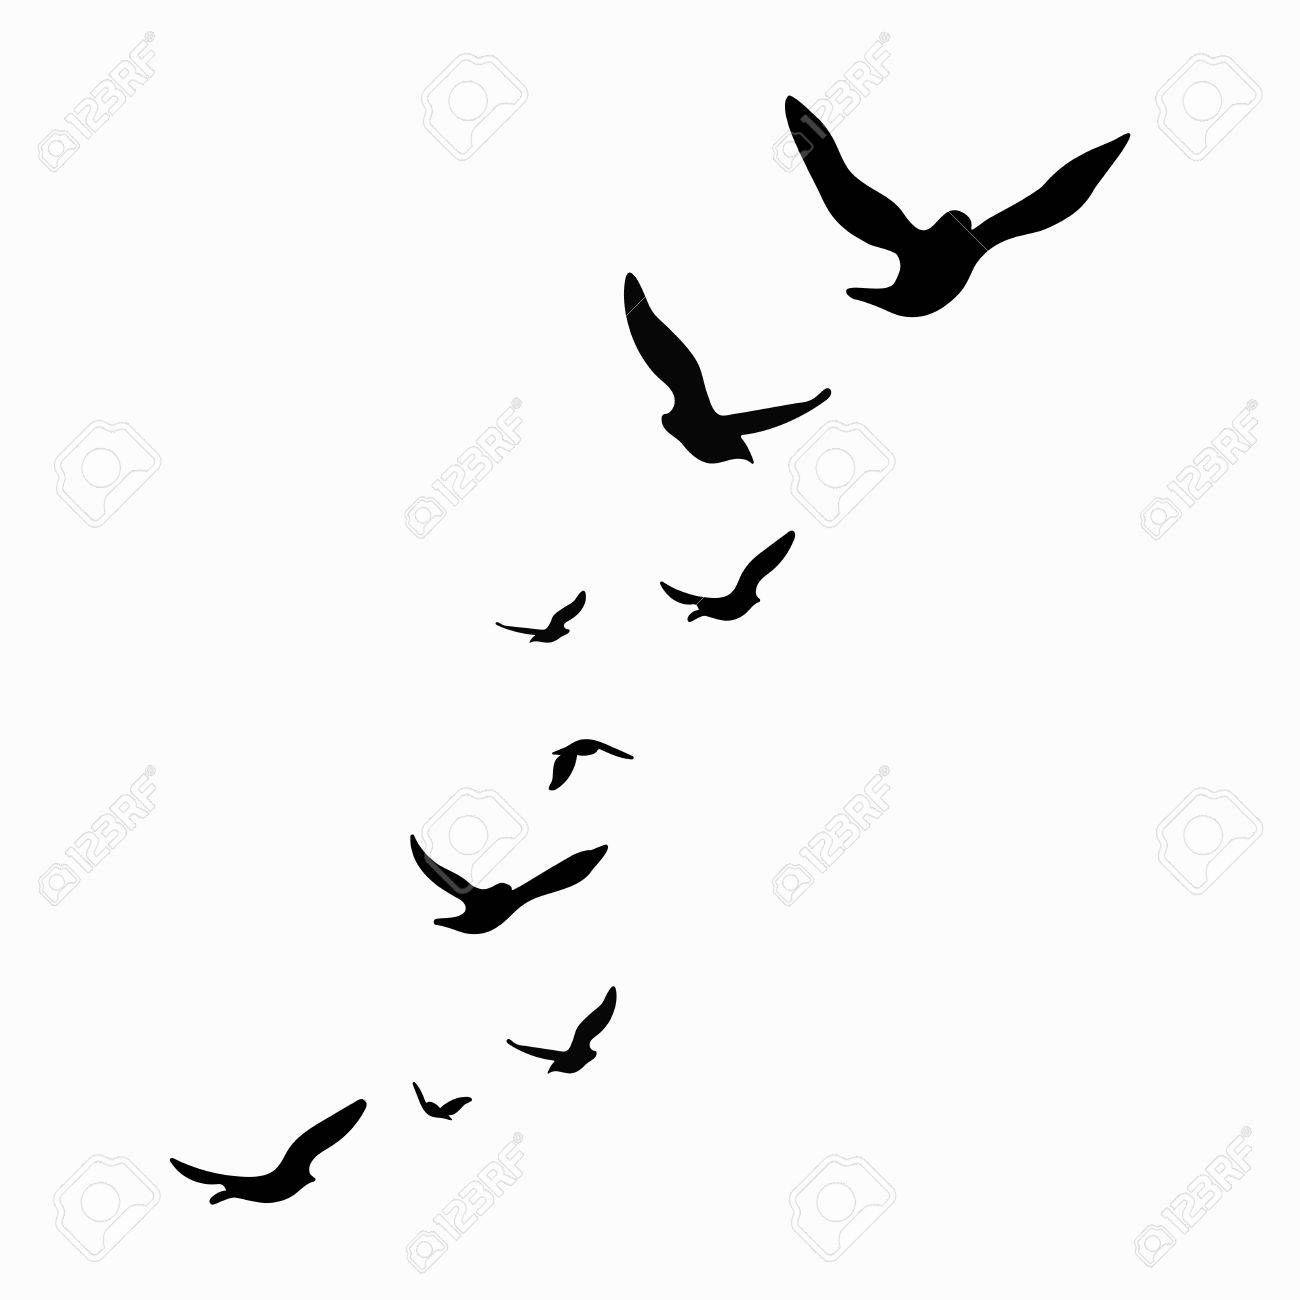 Silhouette Of A Flock Of Birds Black Contours Of Flying Birds Flying Bird Silhouette Bird Silhouette Art Bird Tattoos Arm